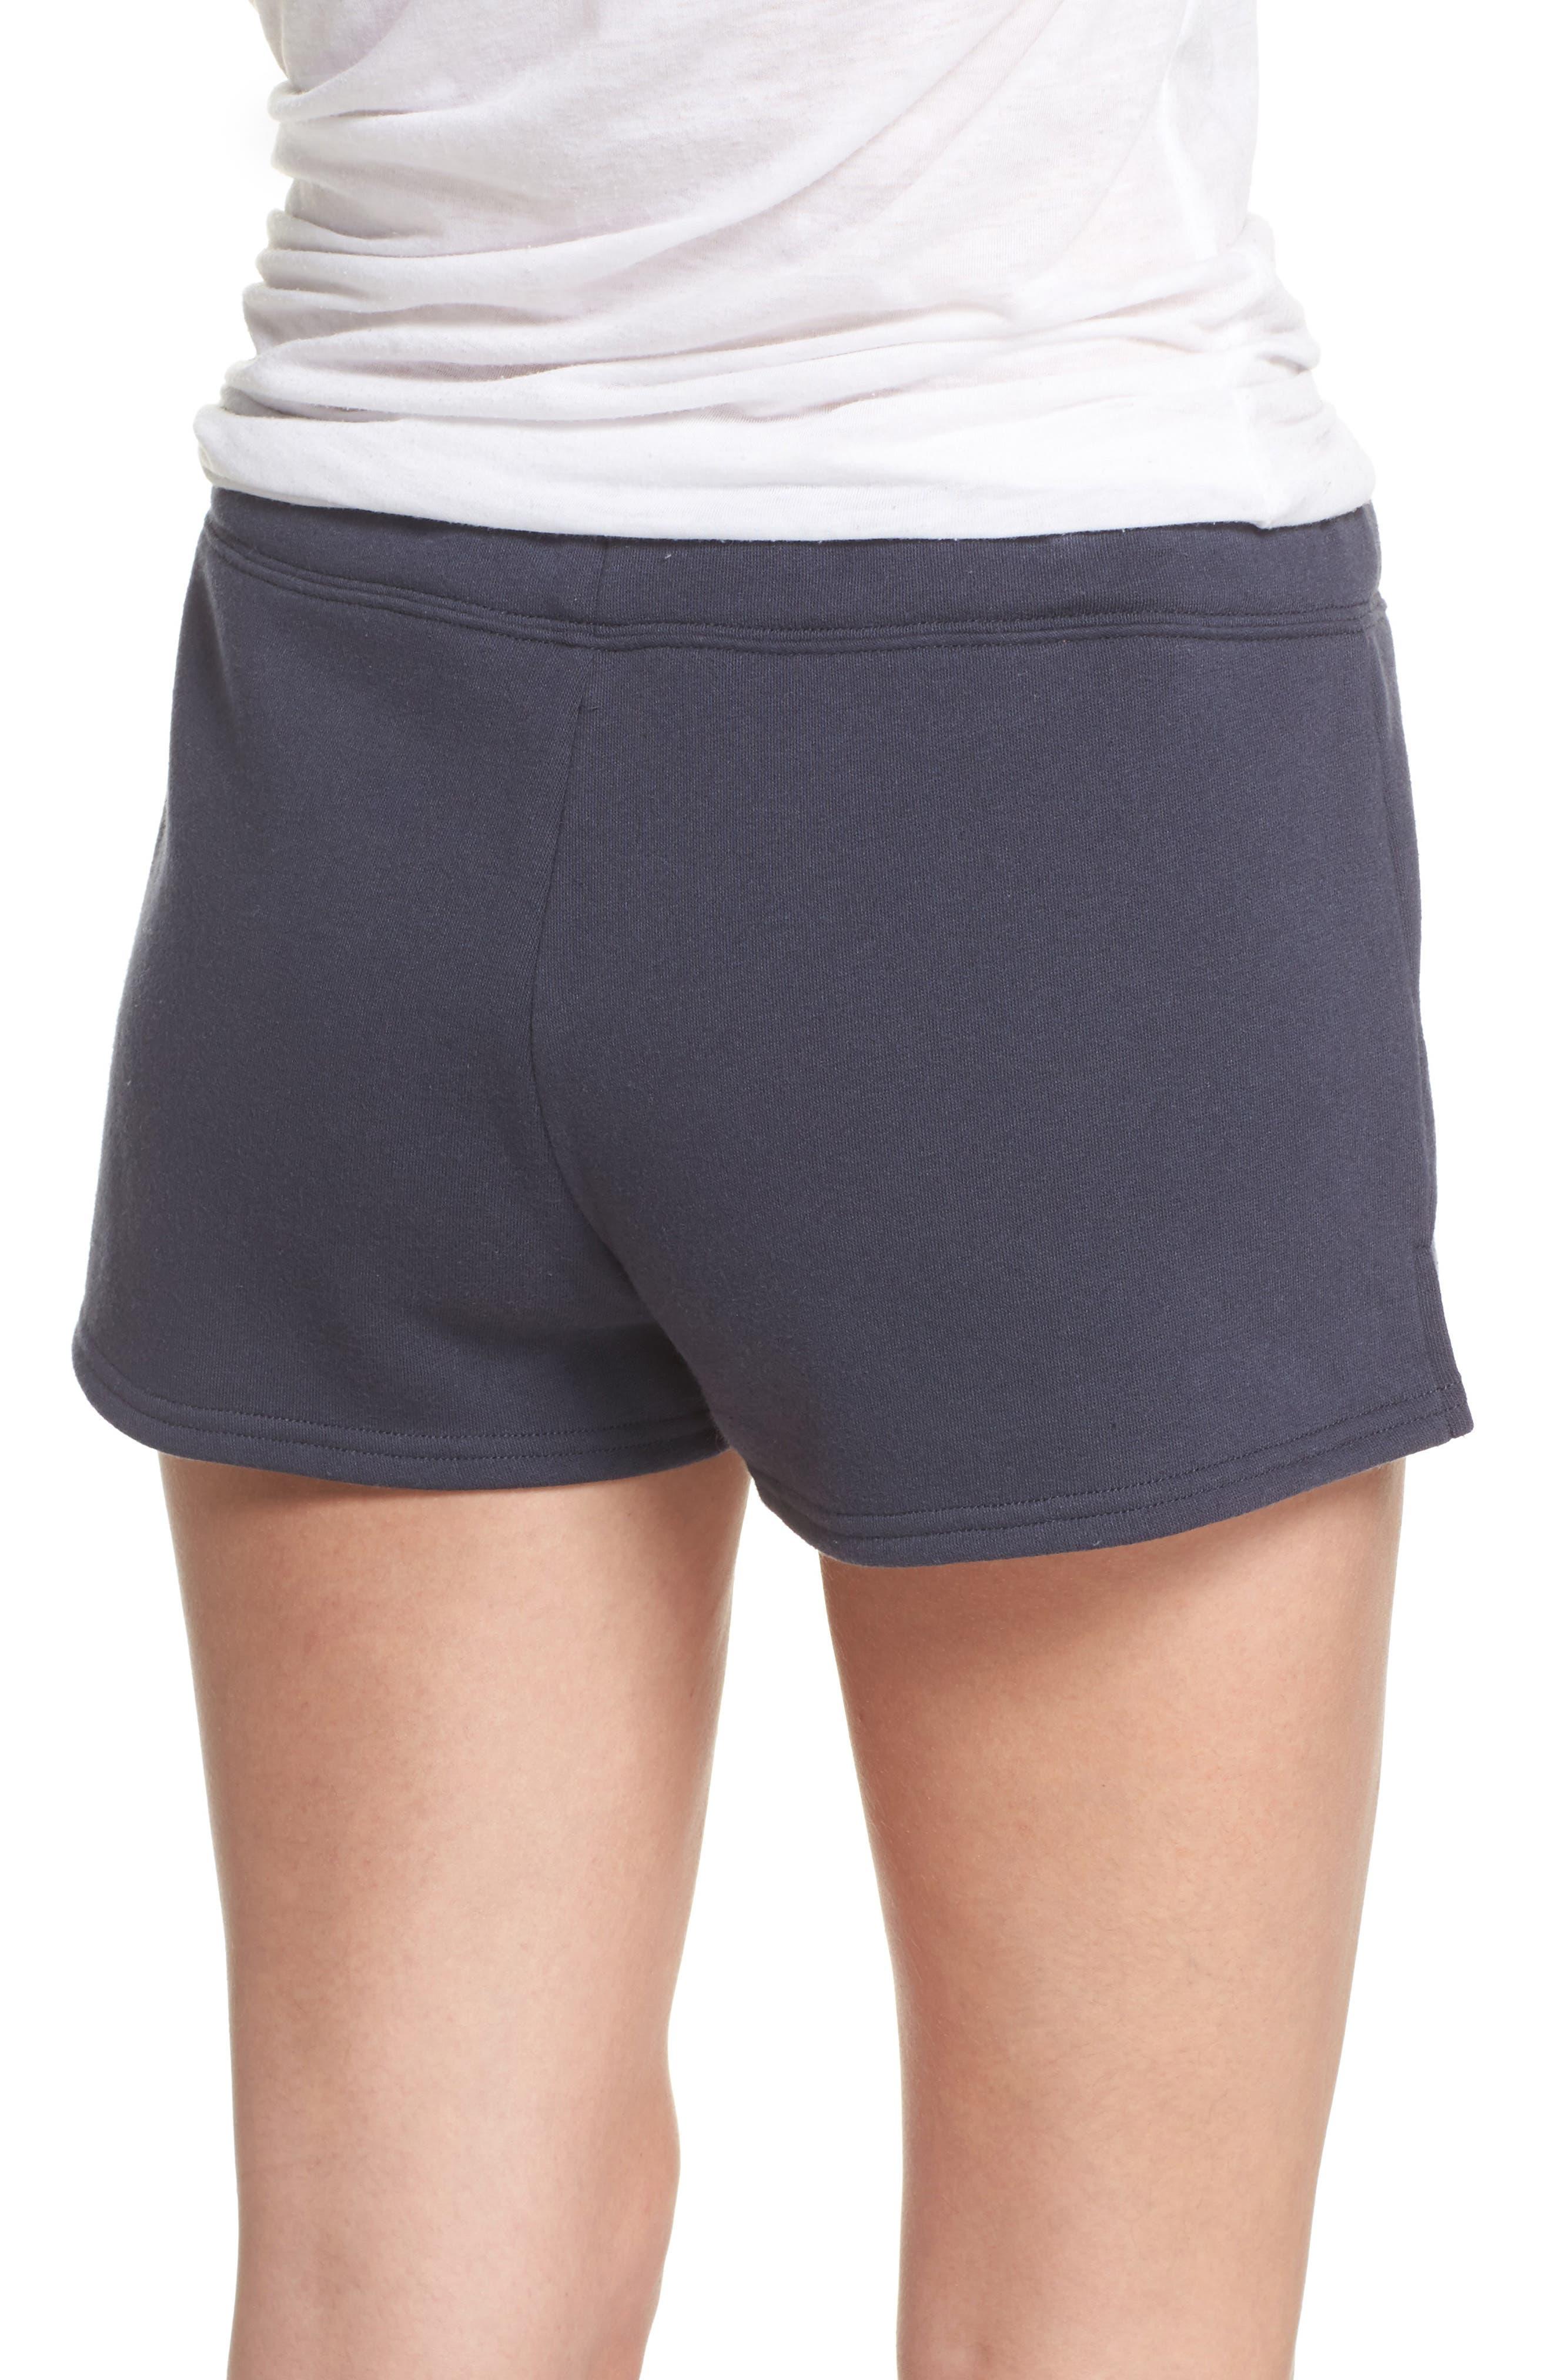 Take It Easy Lounge Shorts,                             Alternate thumbnail 2, color,                             Navy Blue